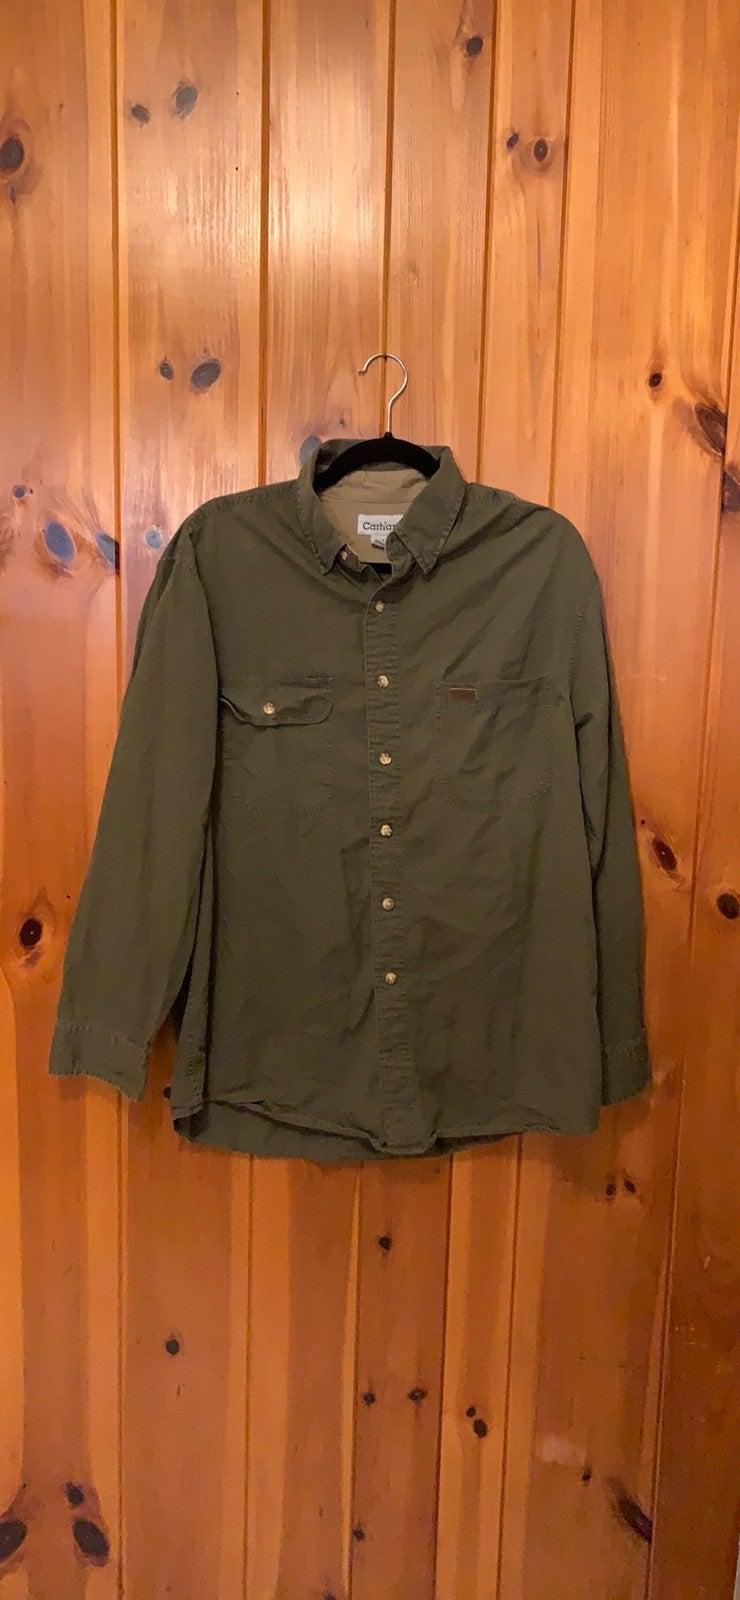 Carhartt long sleeve shirts for men